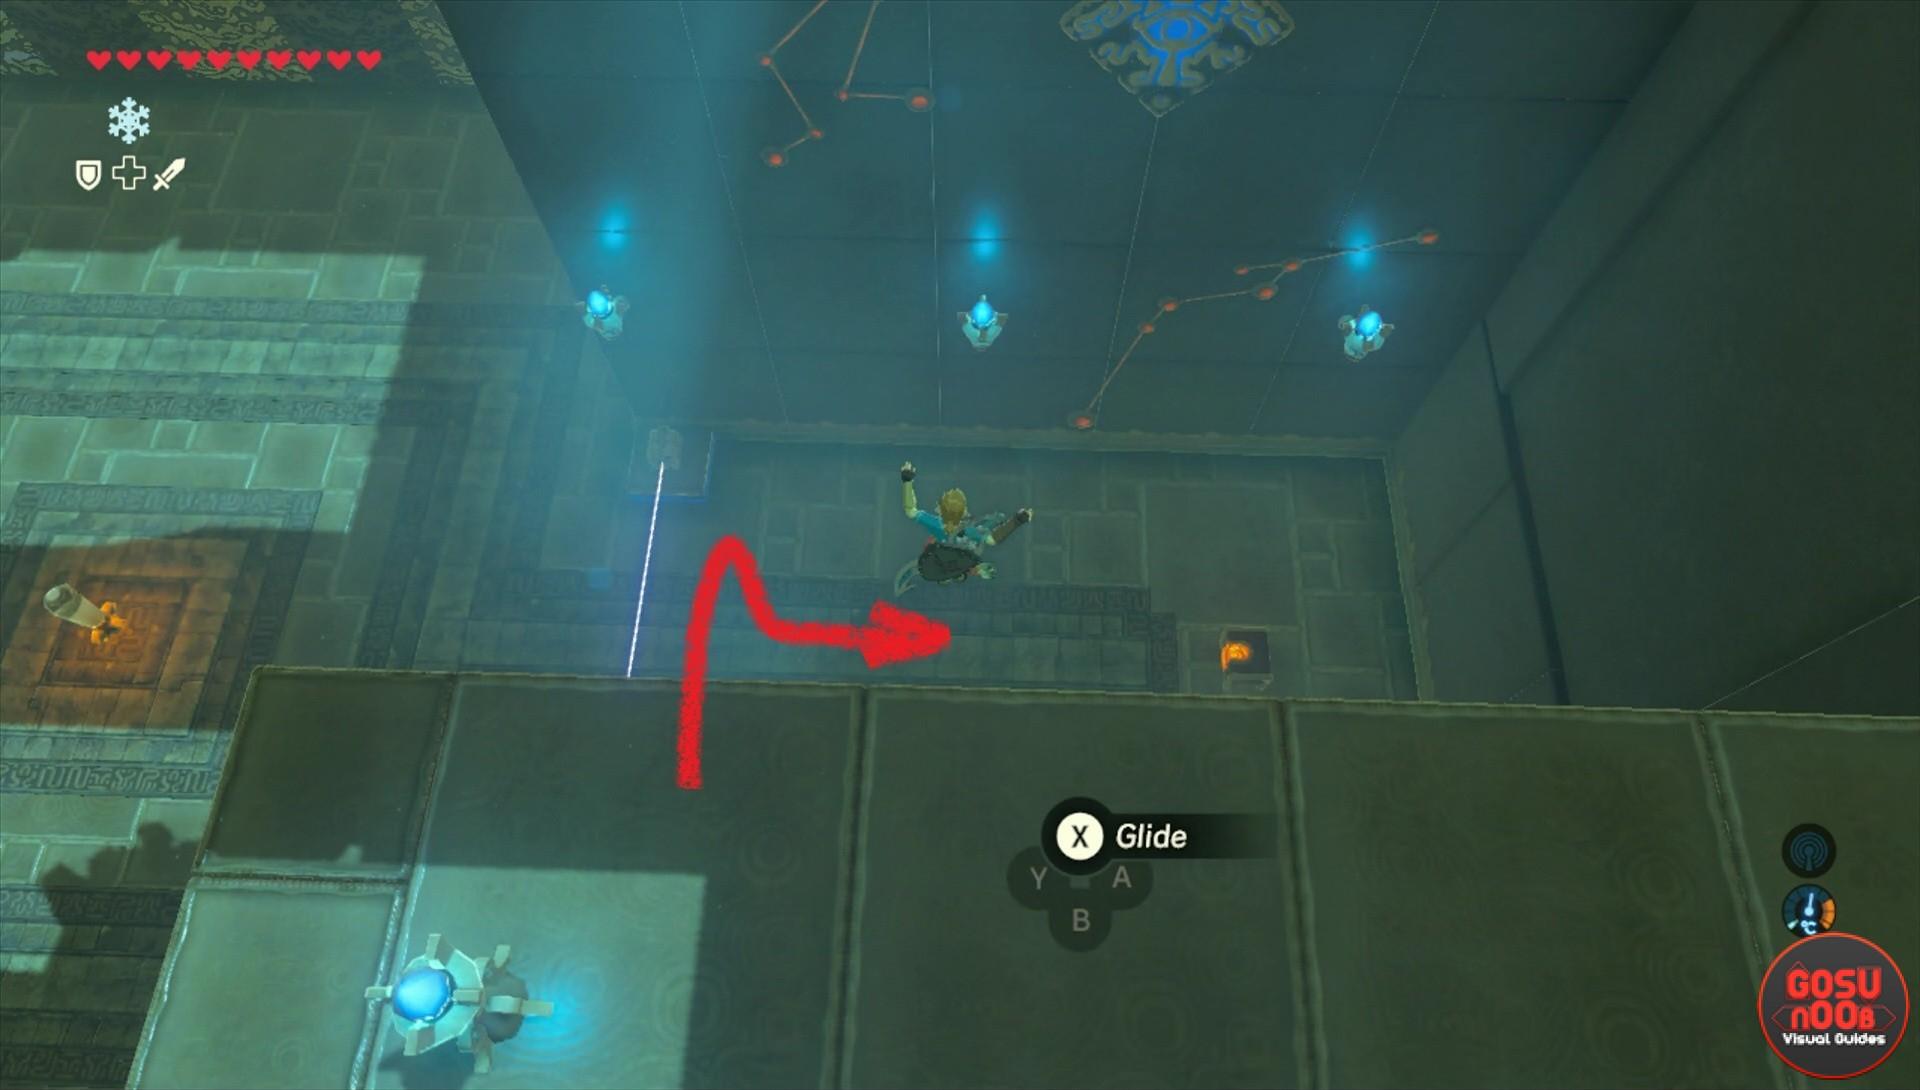 Zelda BotW Ishto Soh Shrine - Bravery's Grasp Challenge